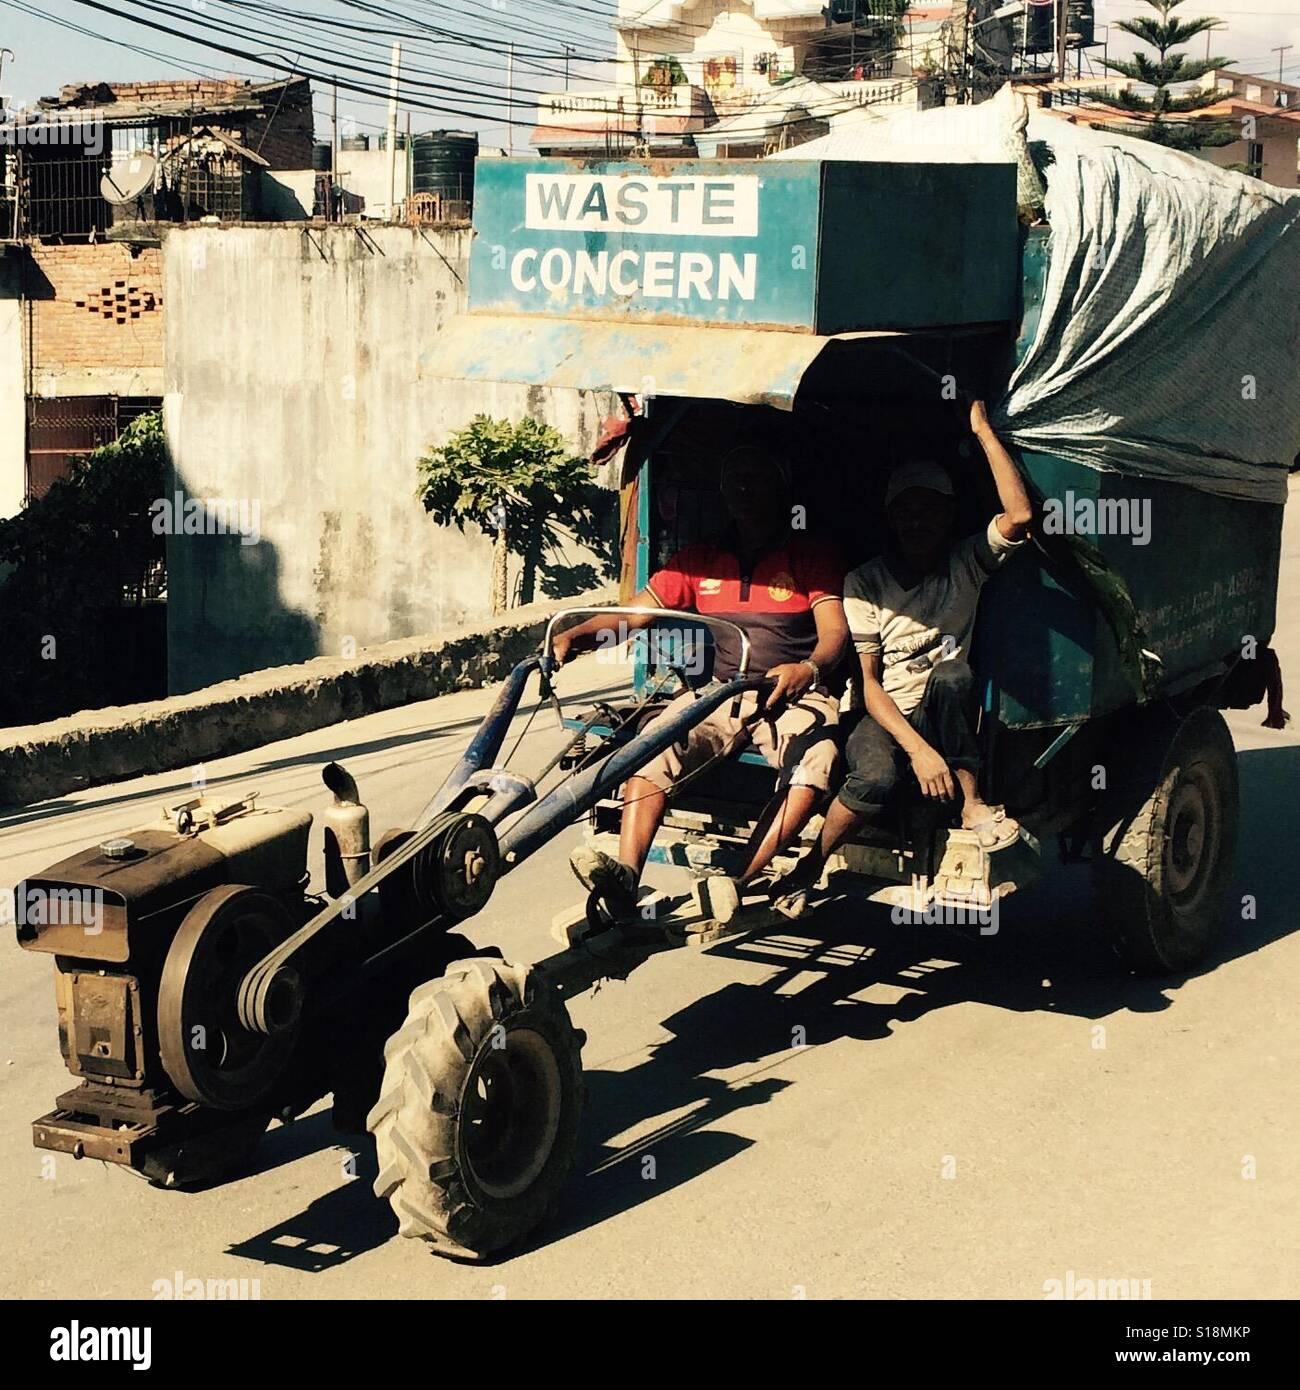 Waste Concern truck, Kathmandu, 2017 - Stock Image